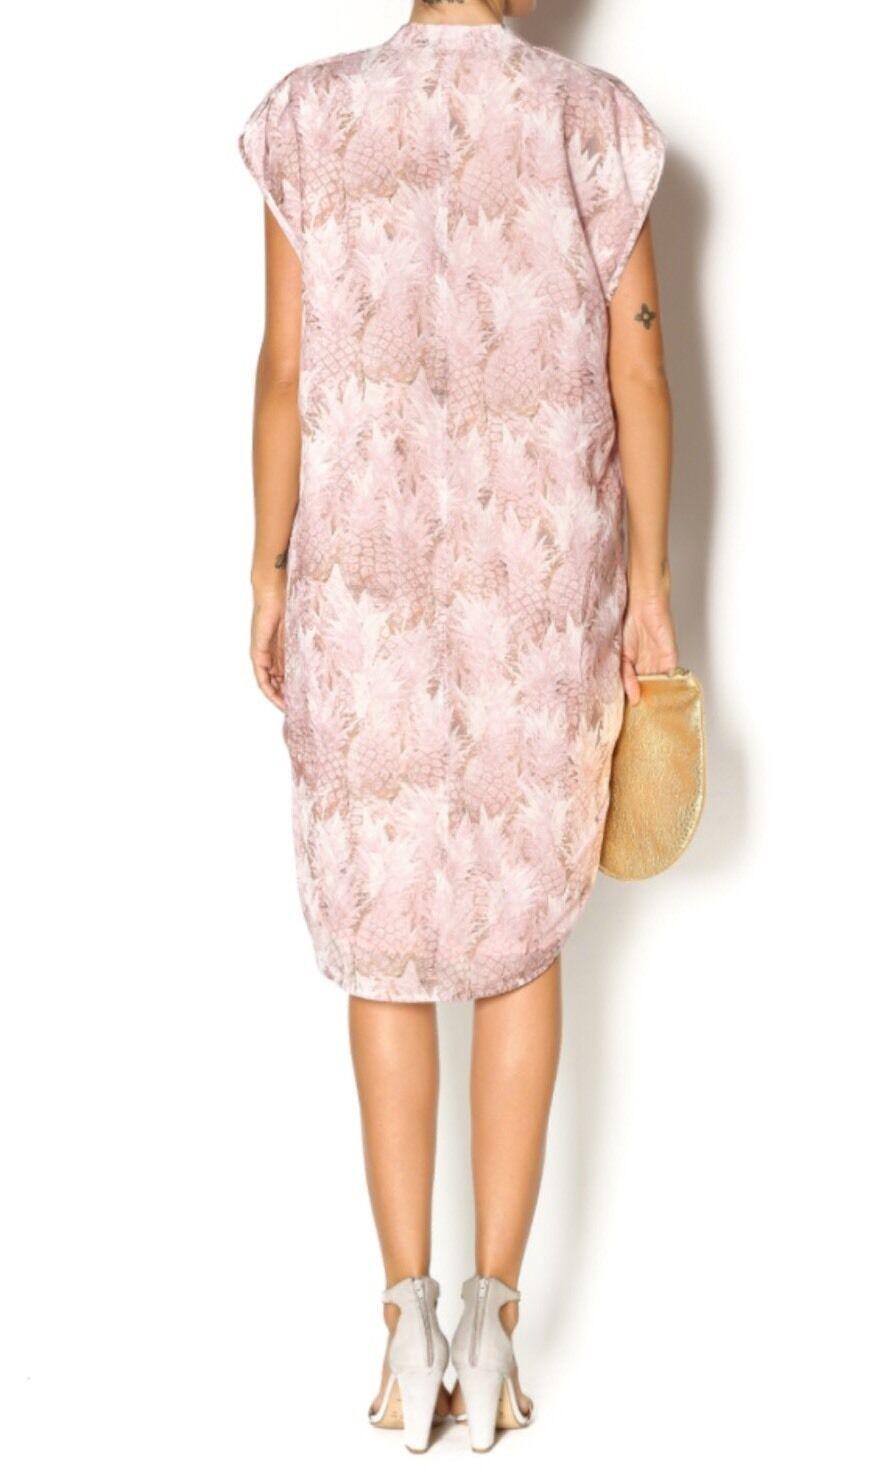 NEW NEW NEW Anthropologie Pineapple Grove Silk Dress Size XS Pink da7cc9